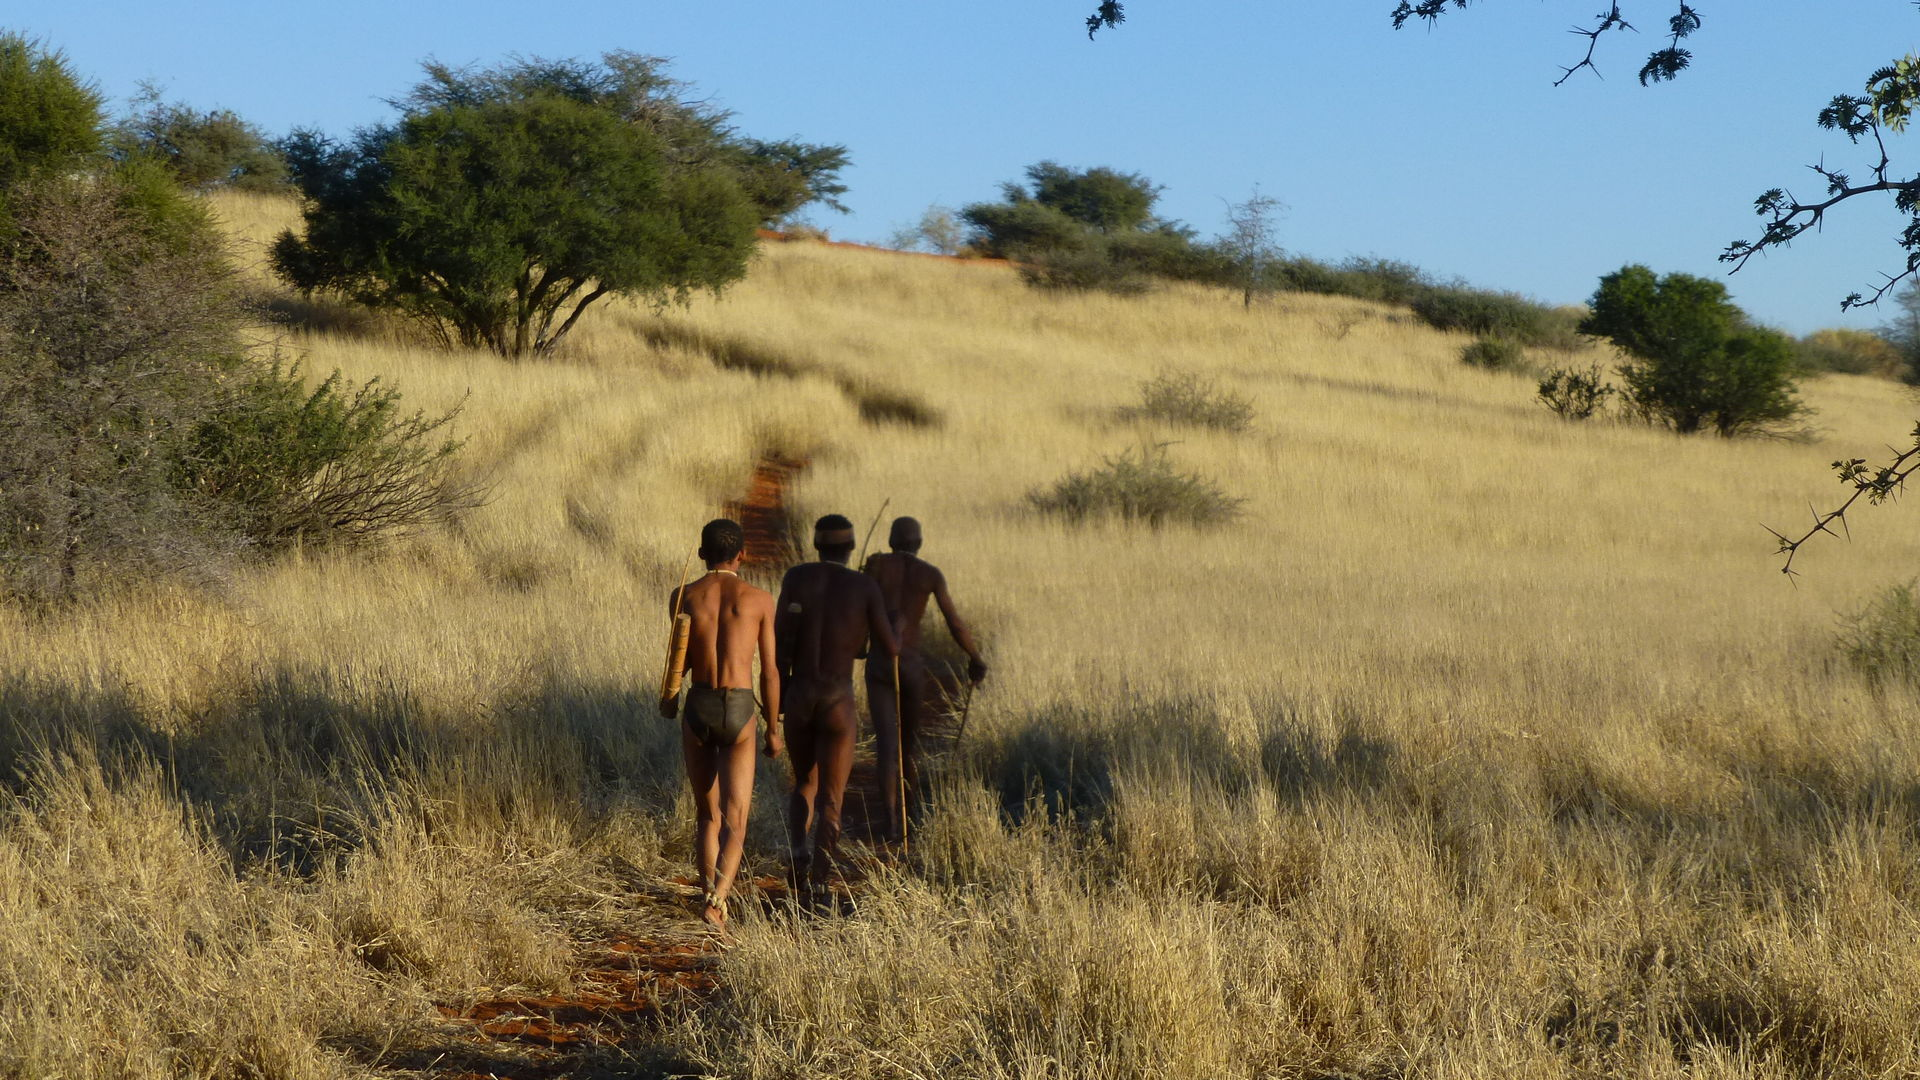 De Kalahari woestijn in Namibie - Kalahari desert - Matoke Tours